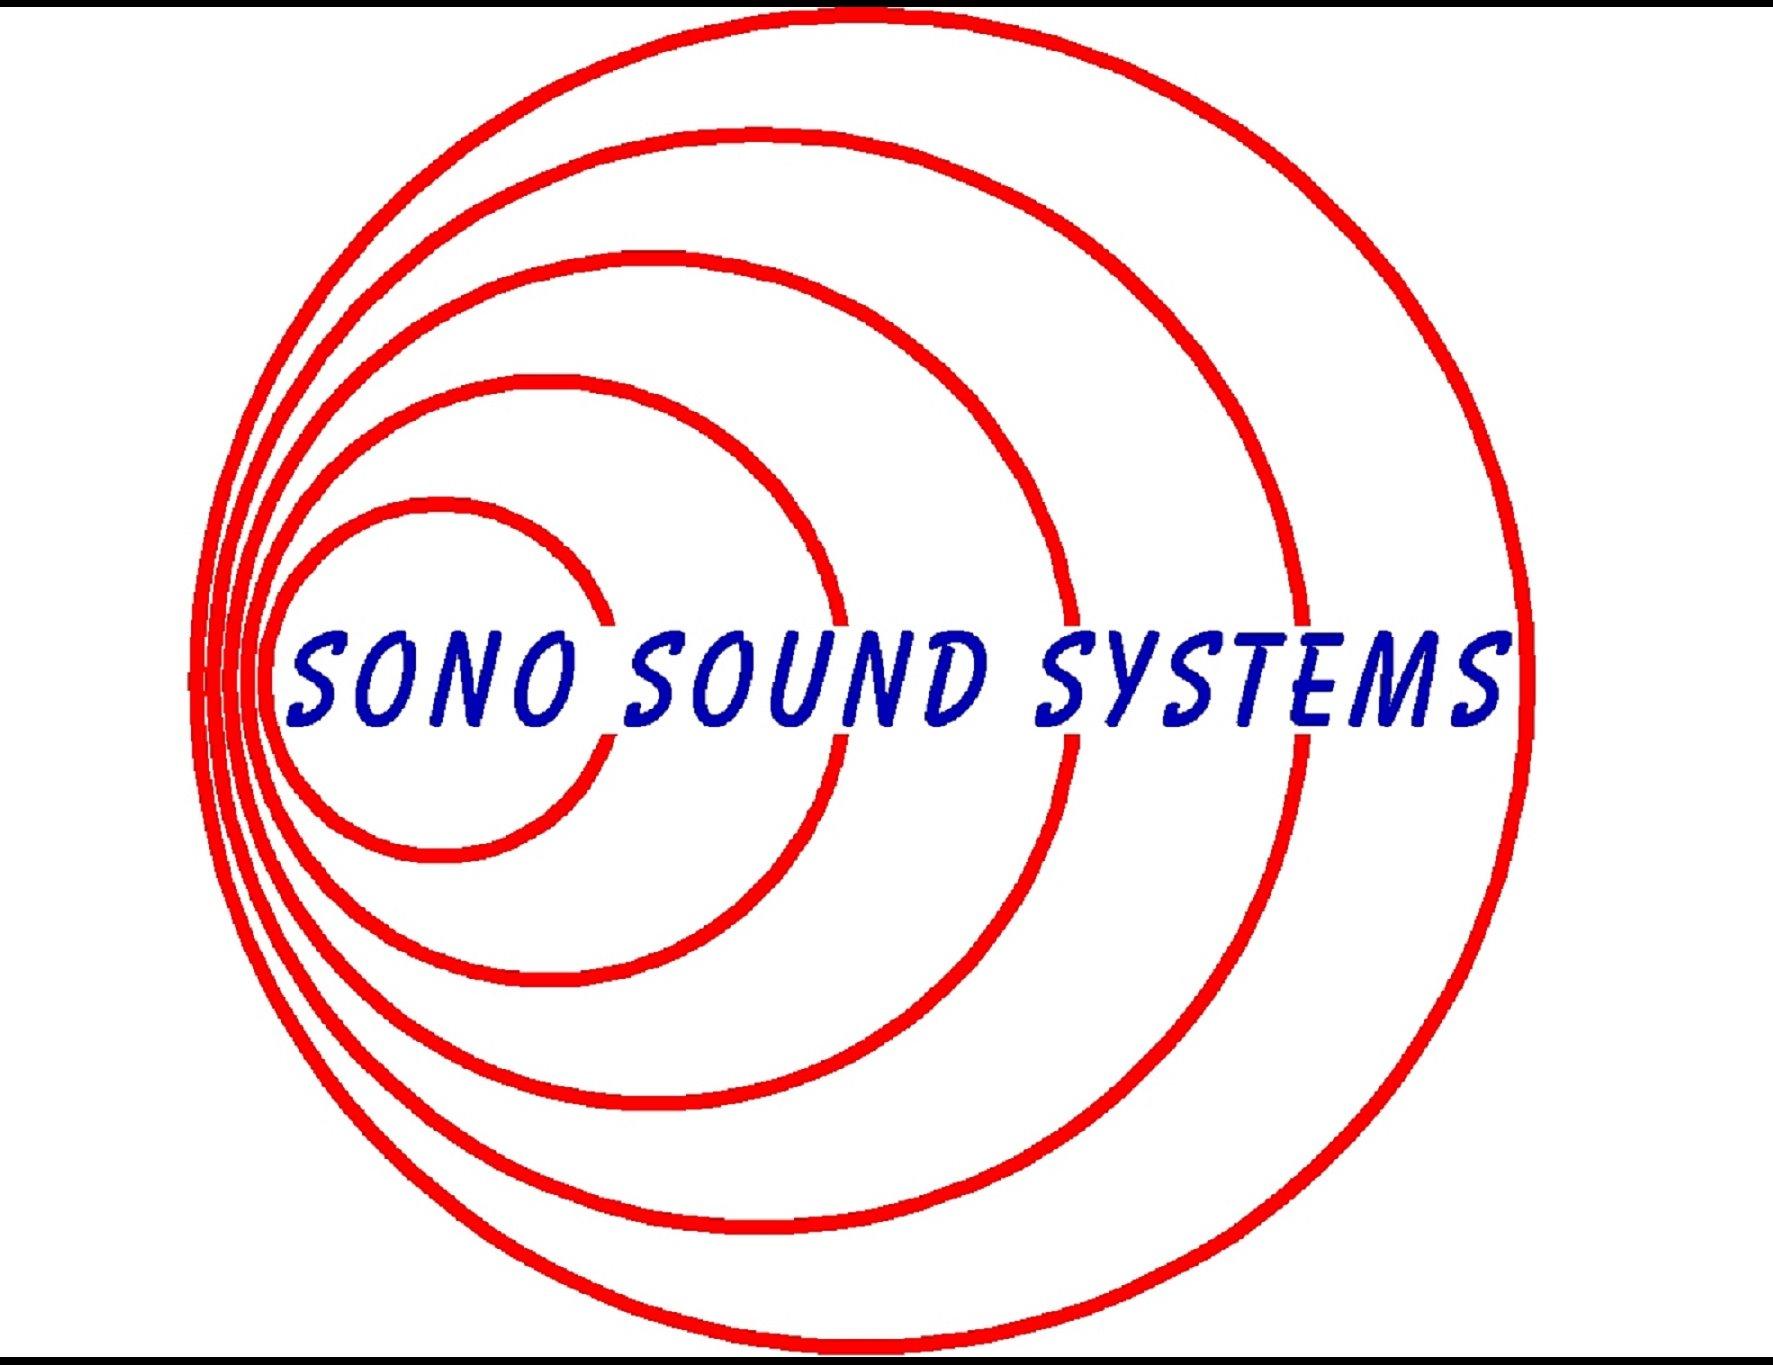 Sono Sound Systems Ltd